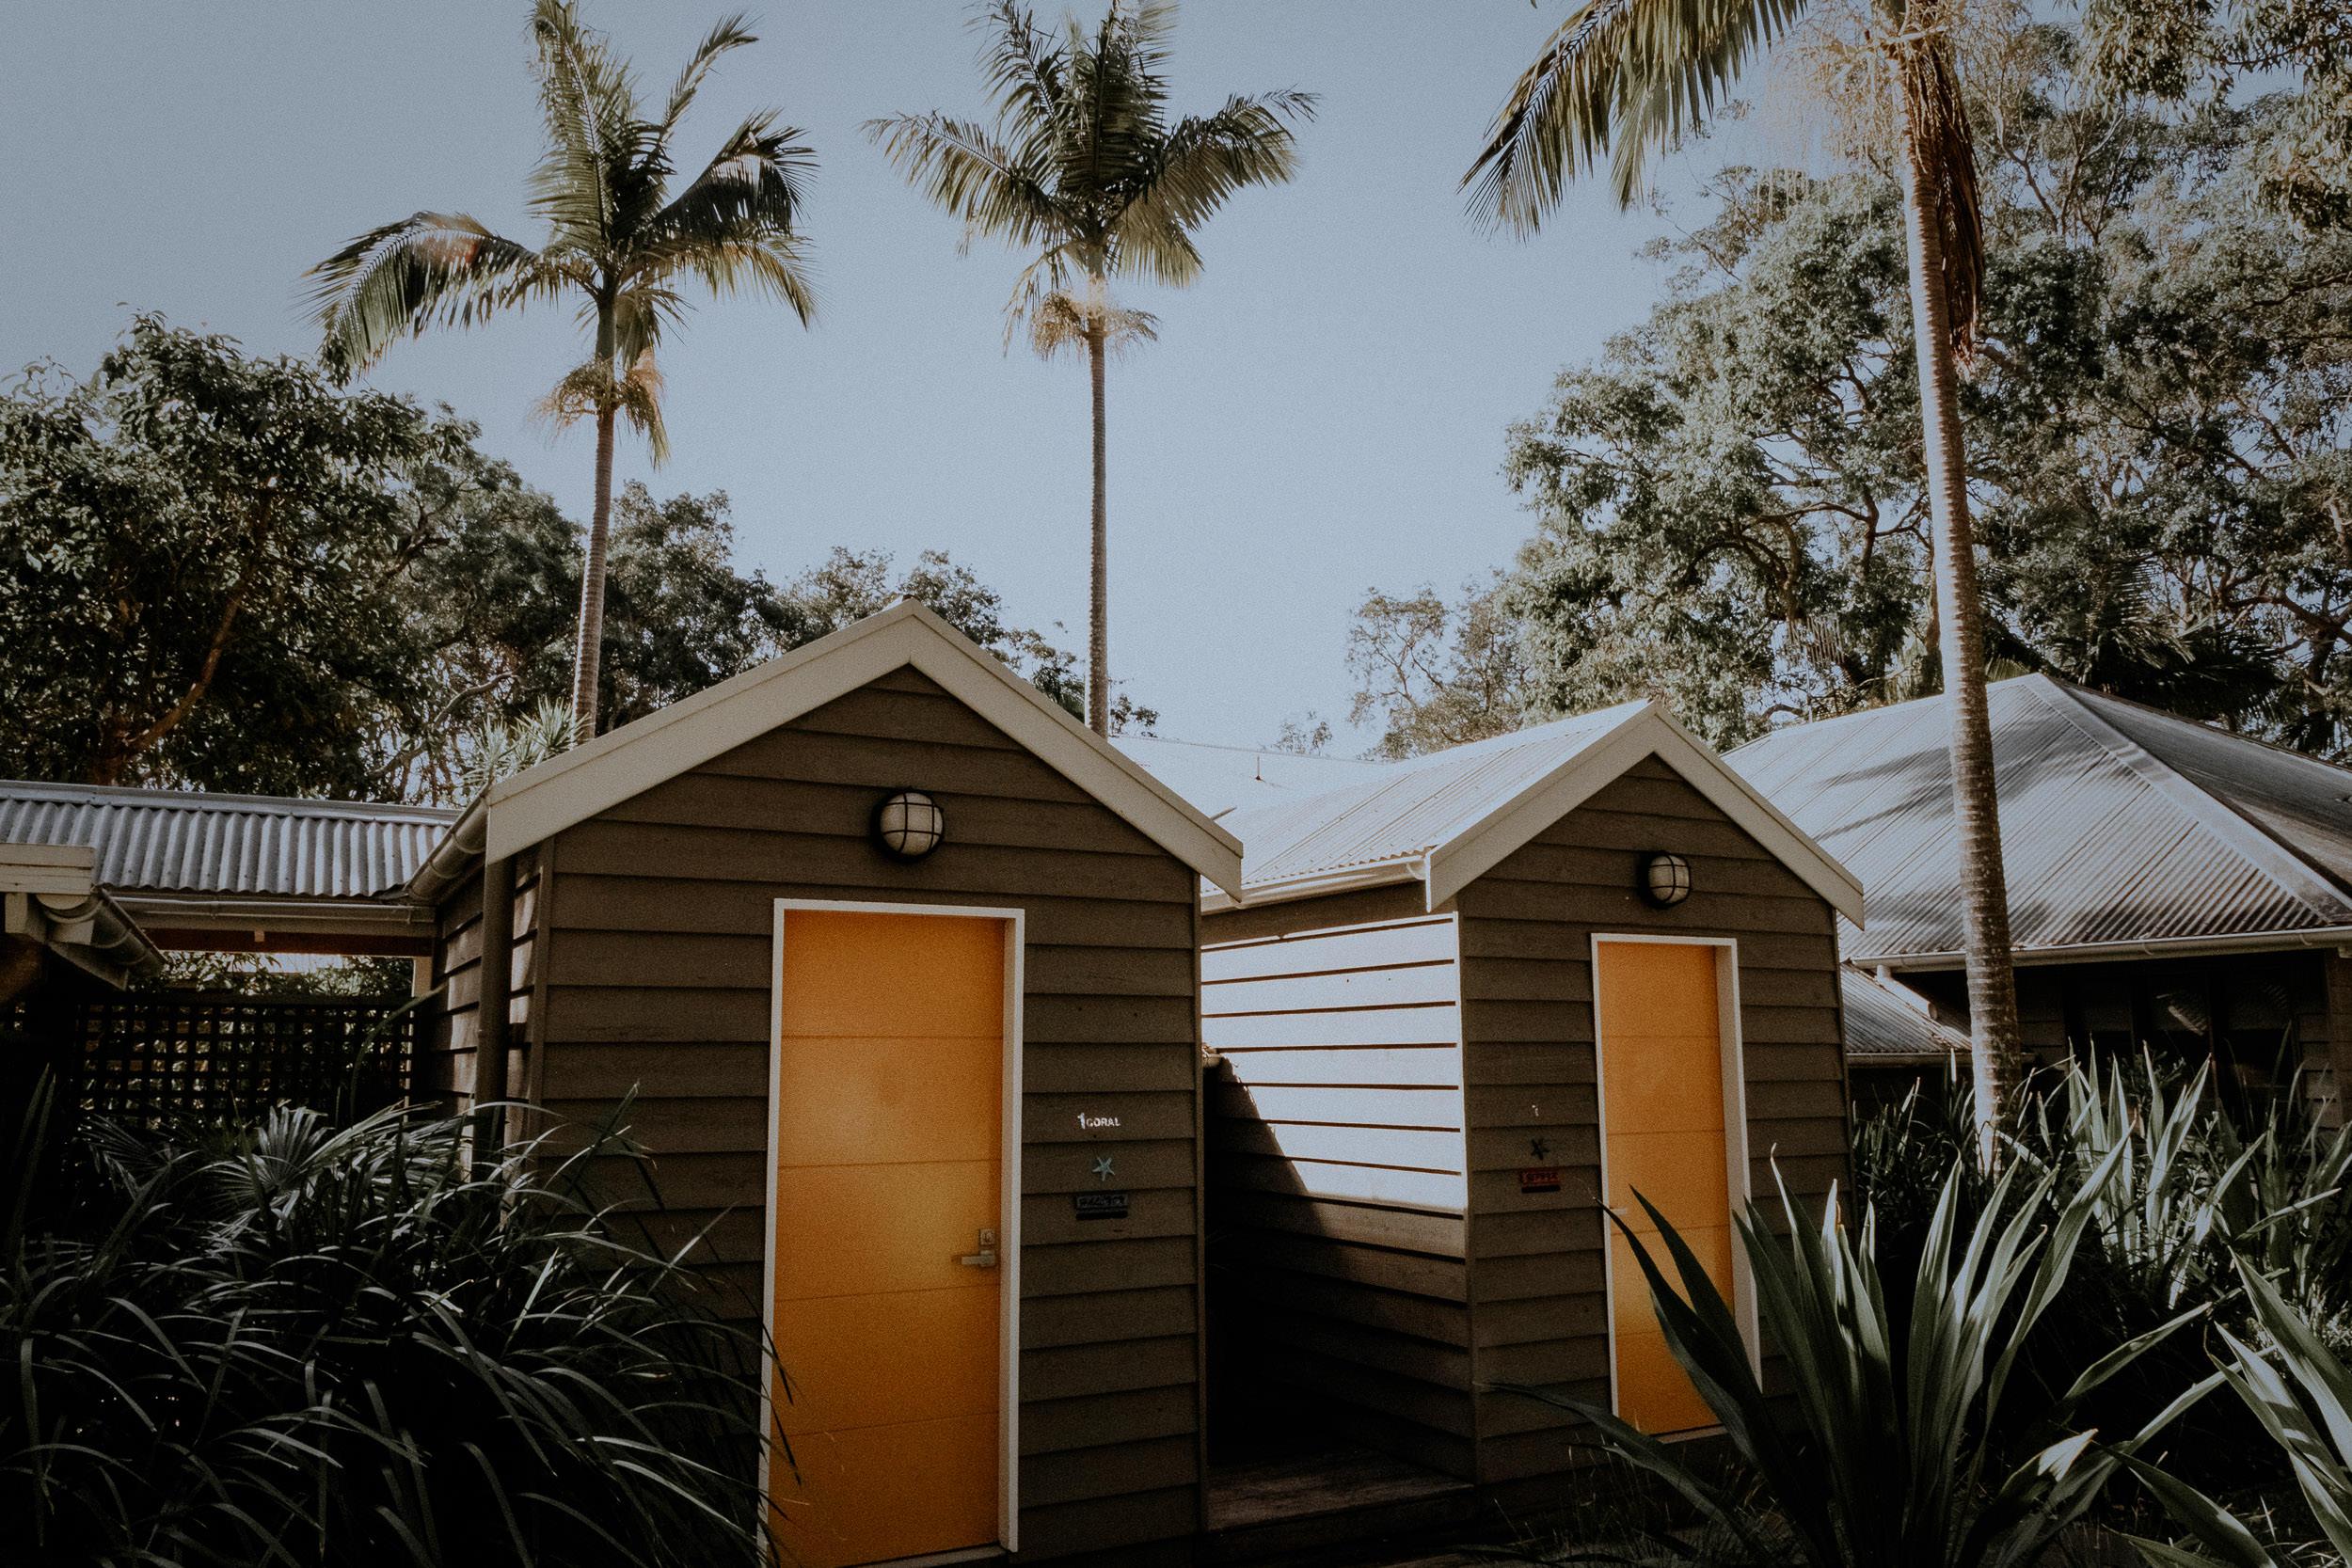 S&A Elopement - Kings & Thieves - Shred 'Til Dead - Central Coast Beach Forest Wedding - 42.jpg